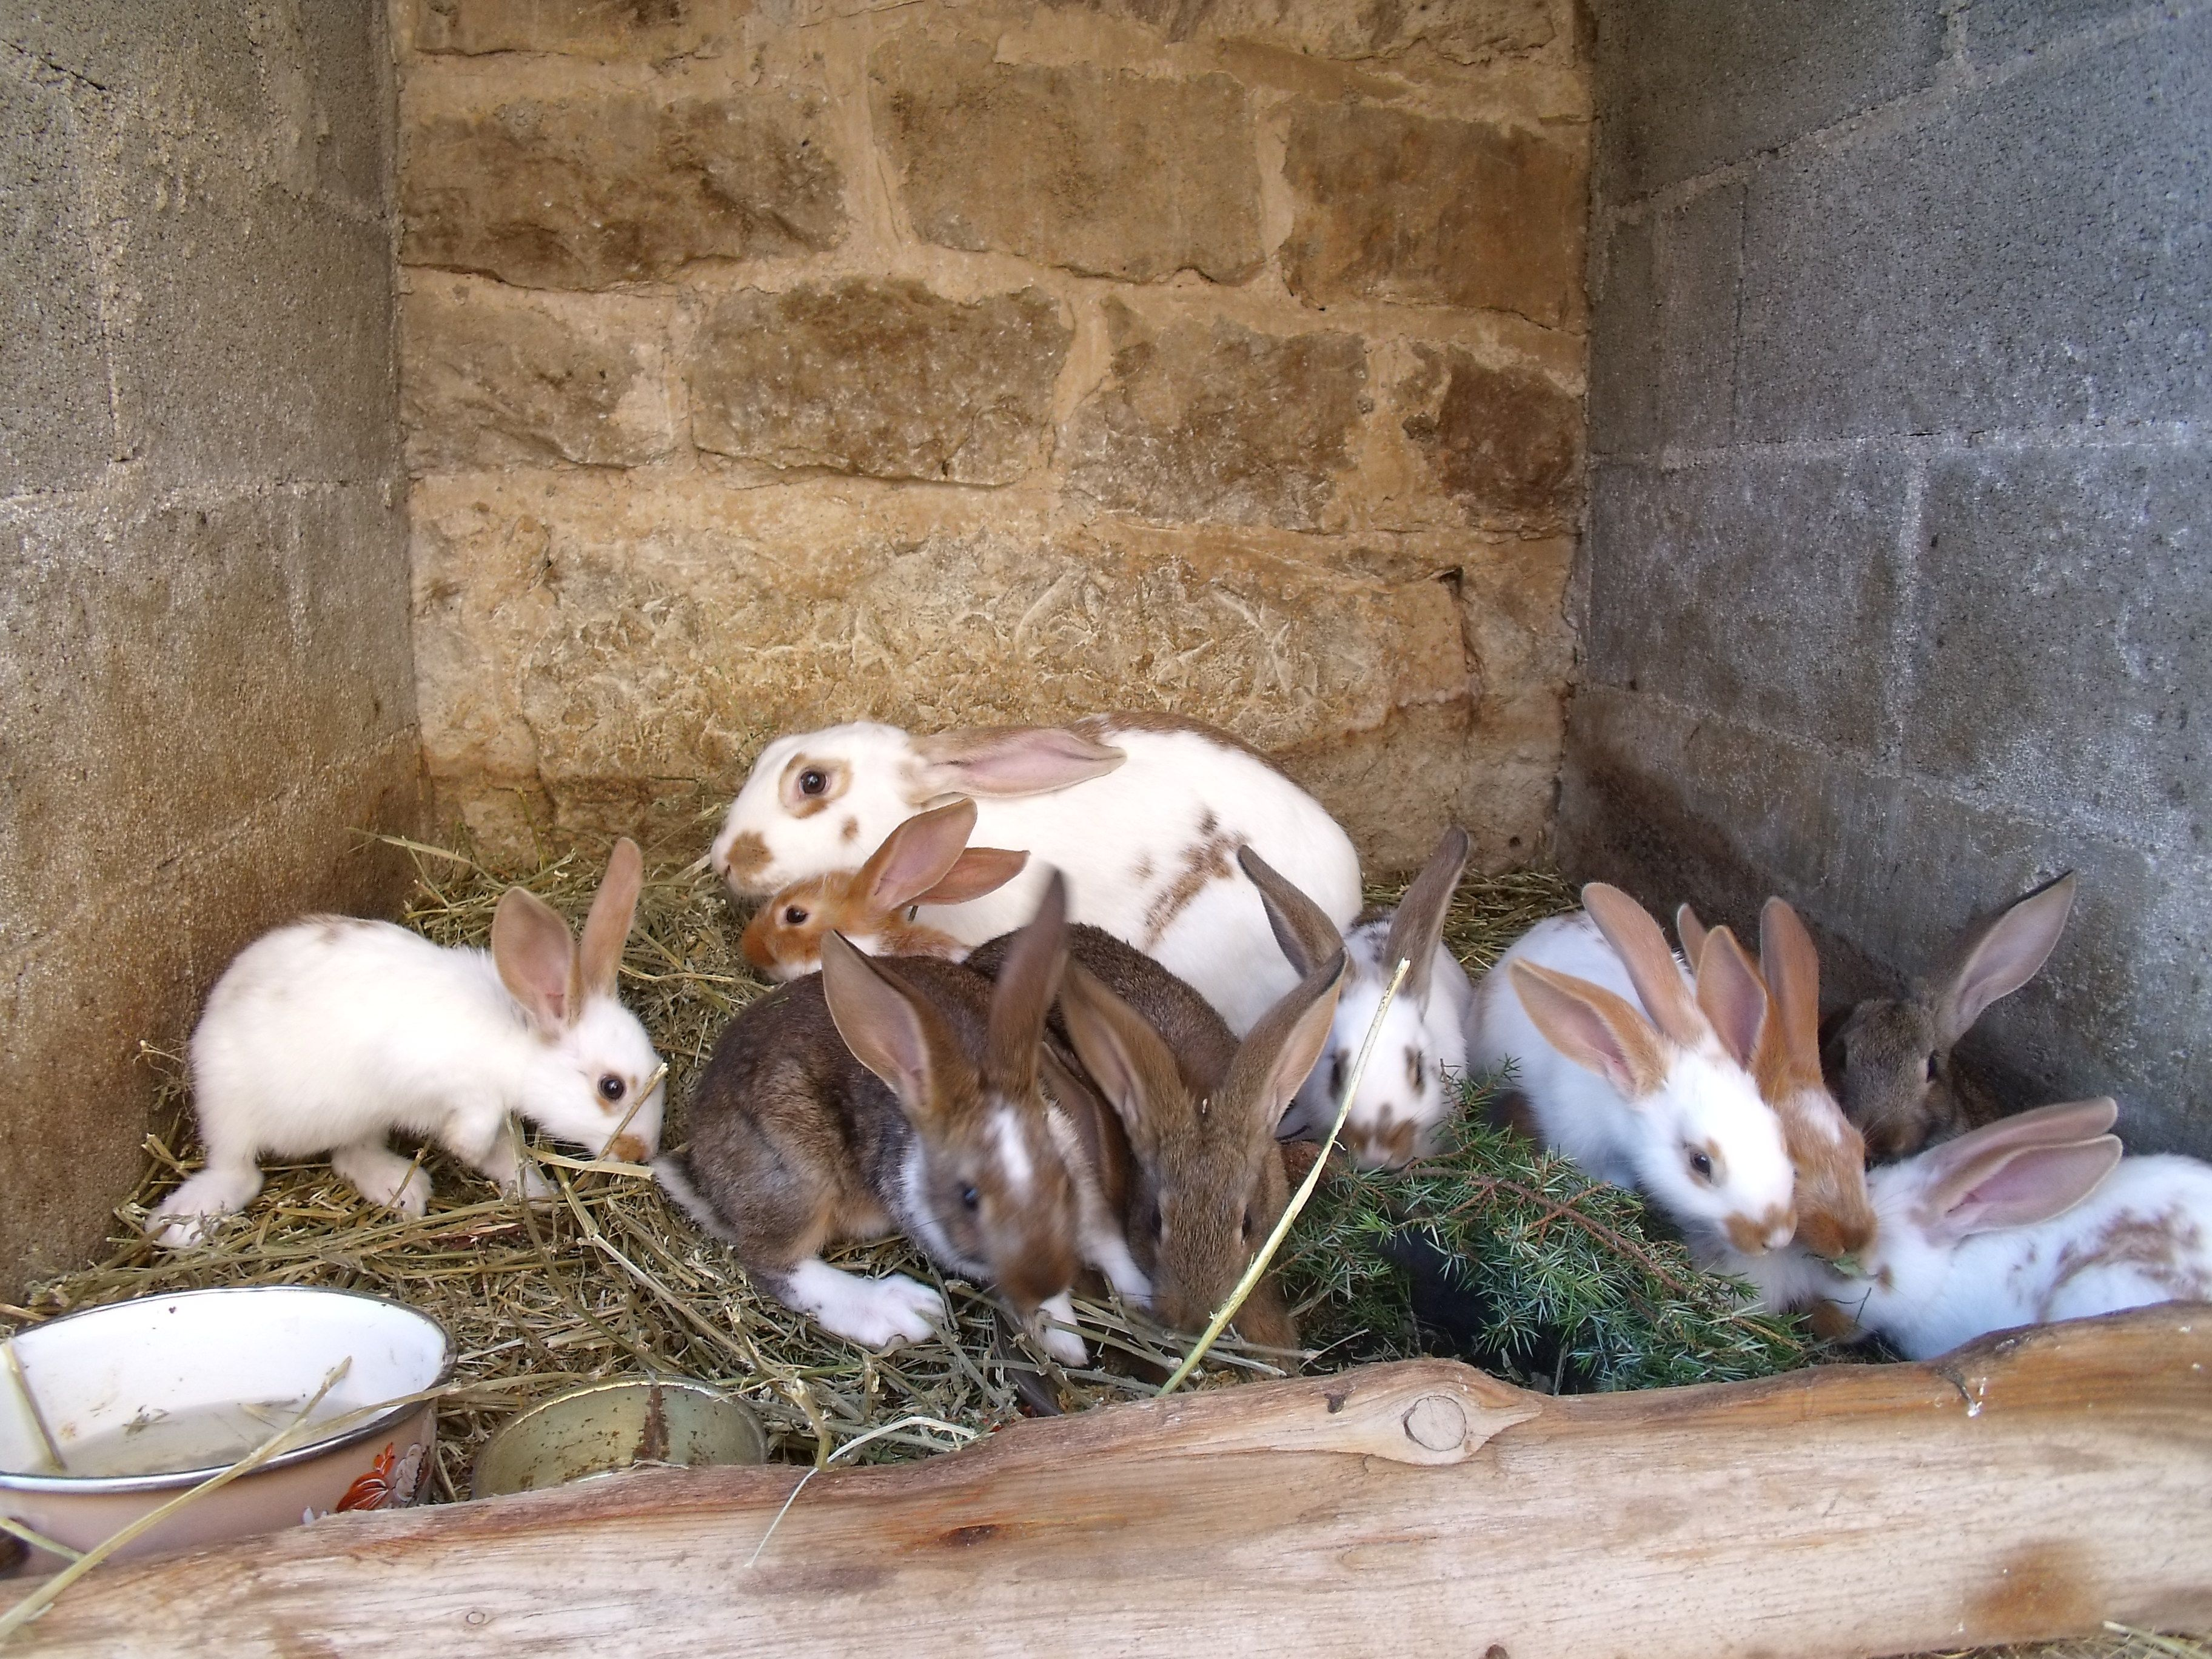 Mes petits lapins aiment les caresses